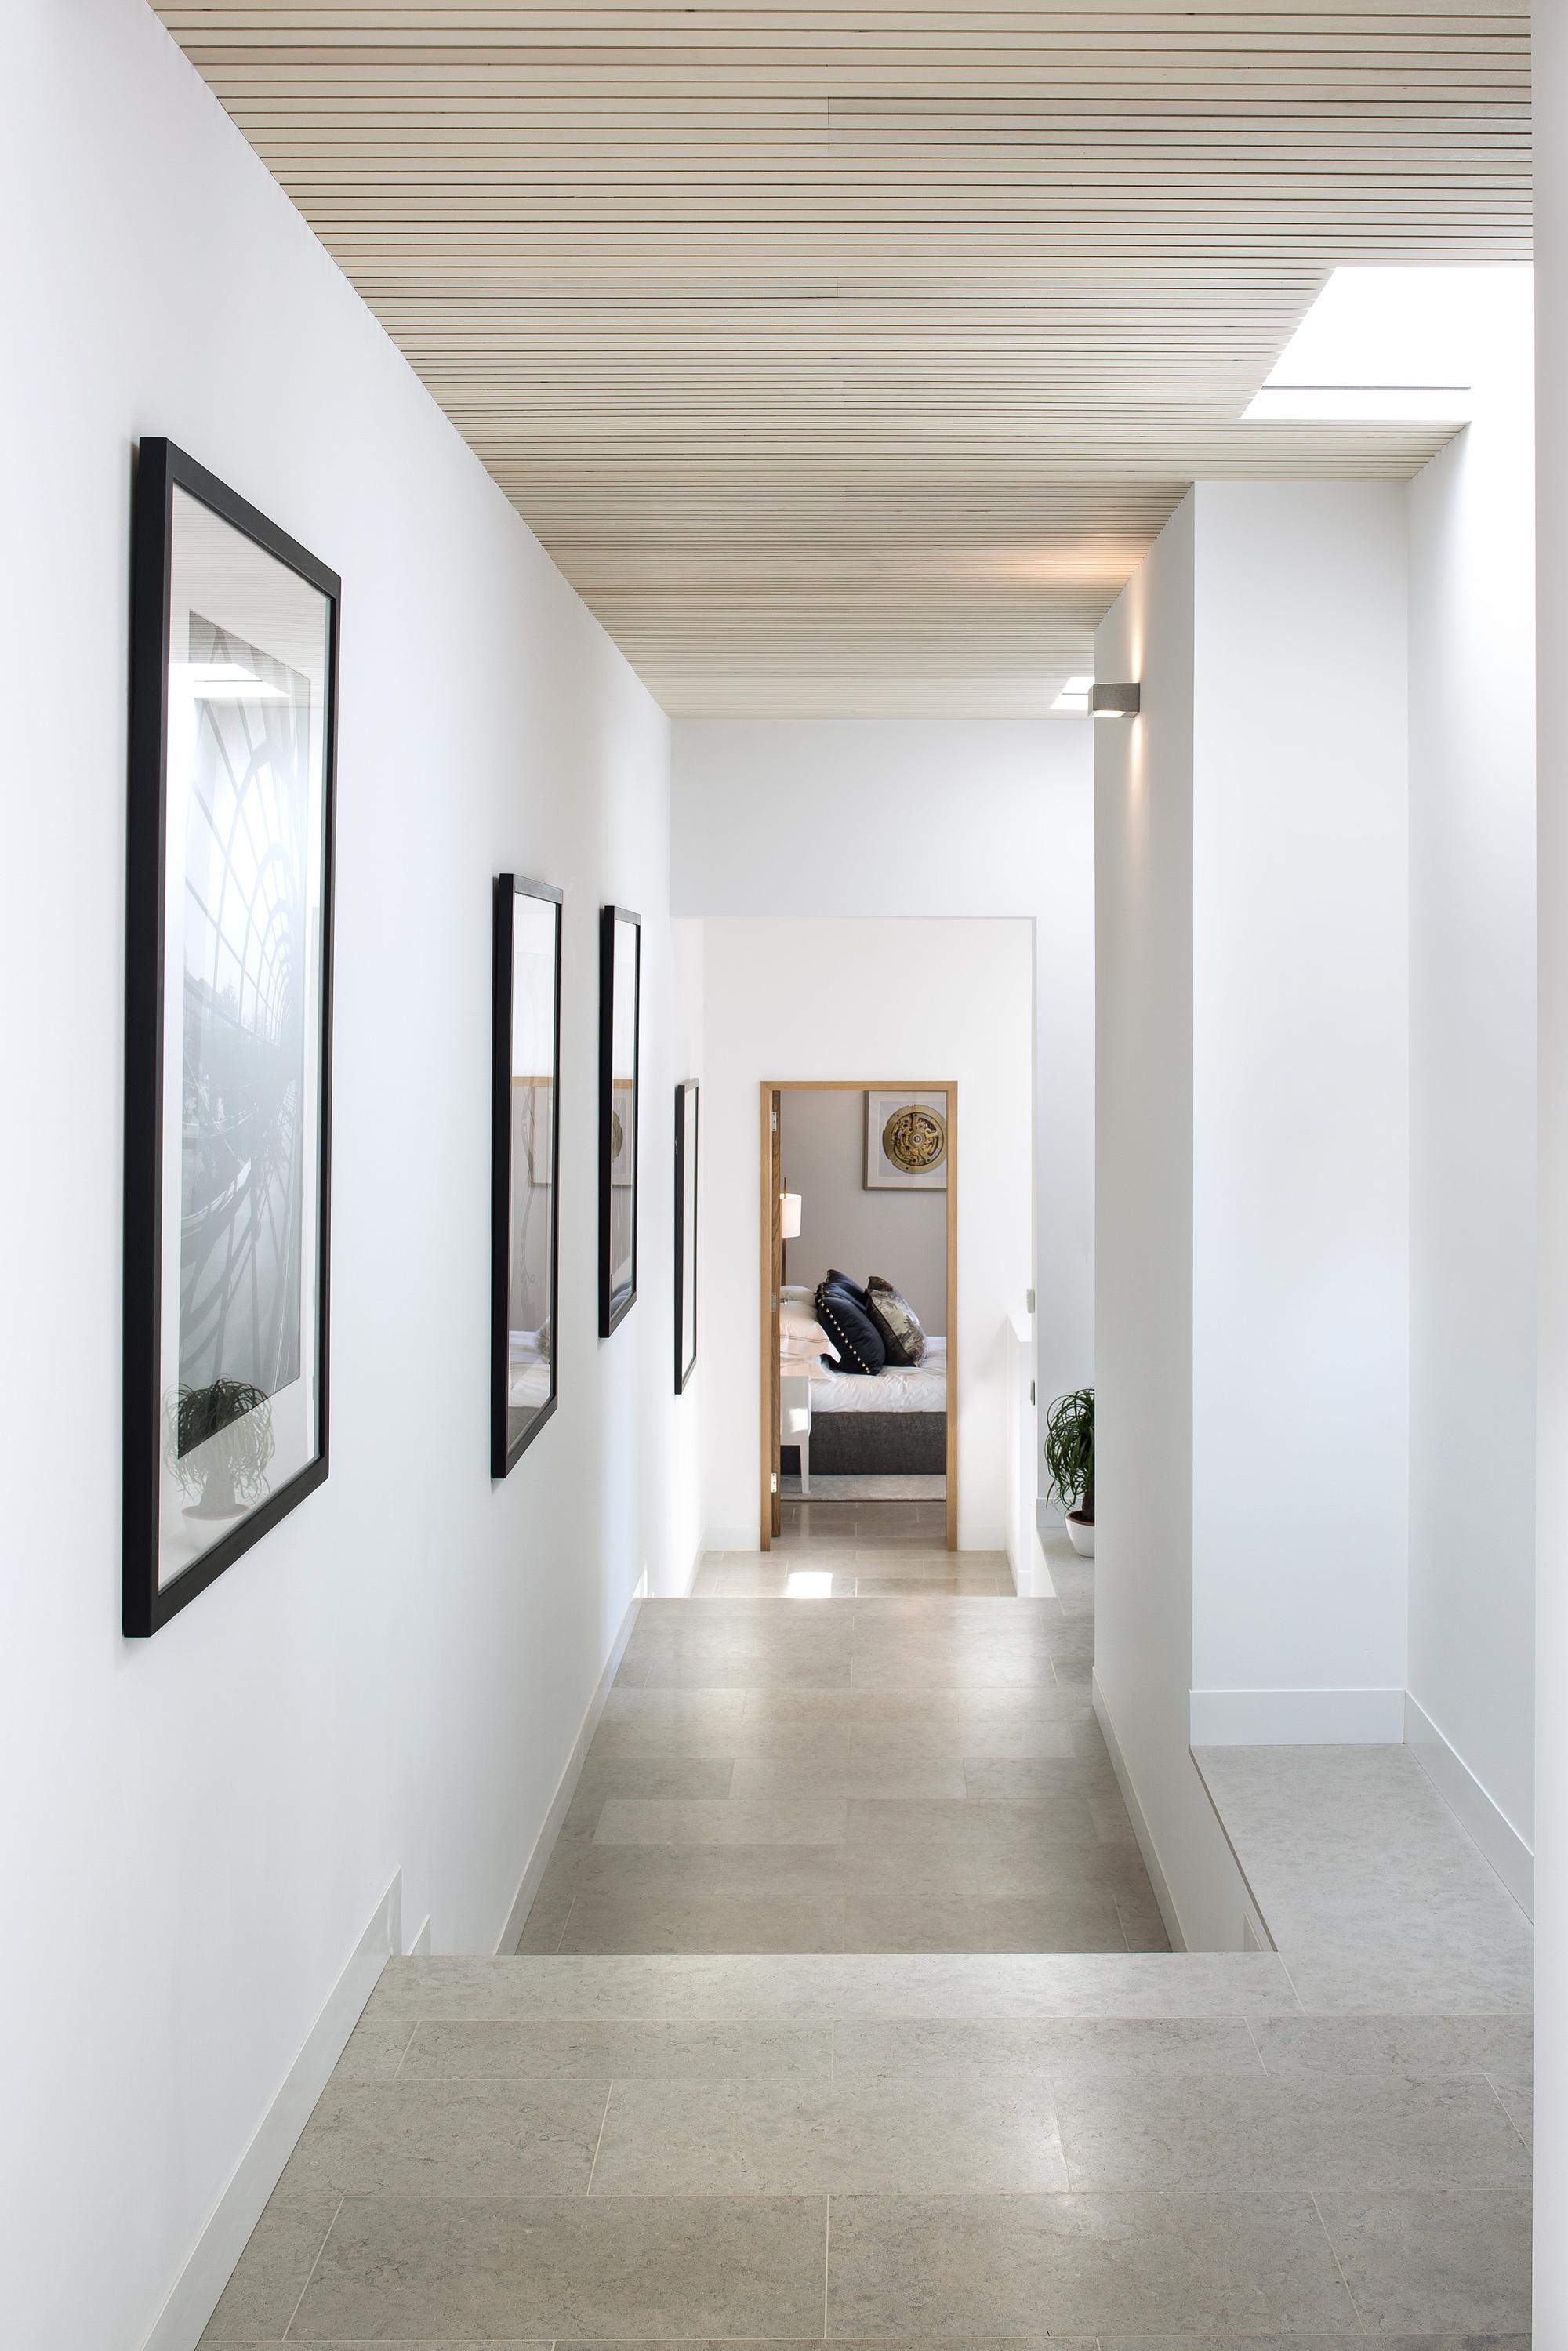 520a39b6e8e44e8d40000053_san-lorenzo-house-de-blacam-and-meagher-architects_sln_1.jpg